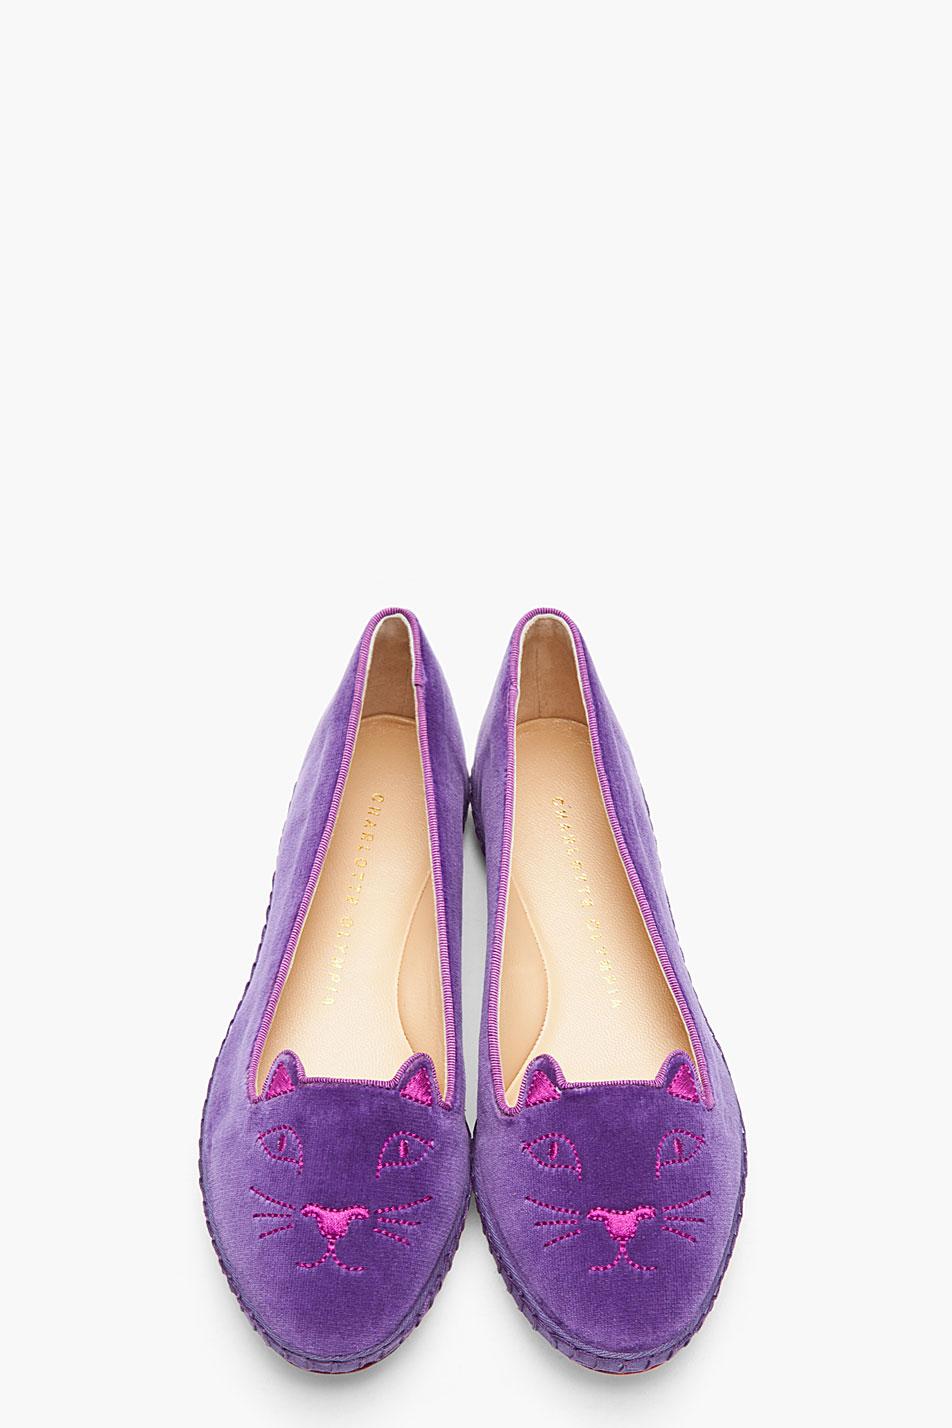 Charlotte Olympia Velvet Espadrille Flats In Purple Lyst